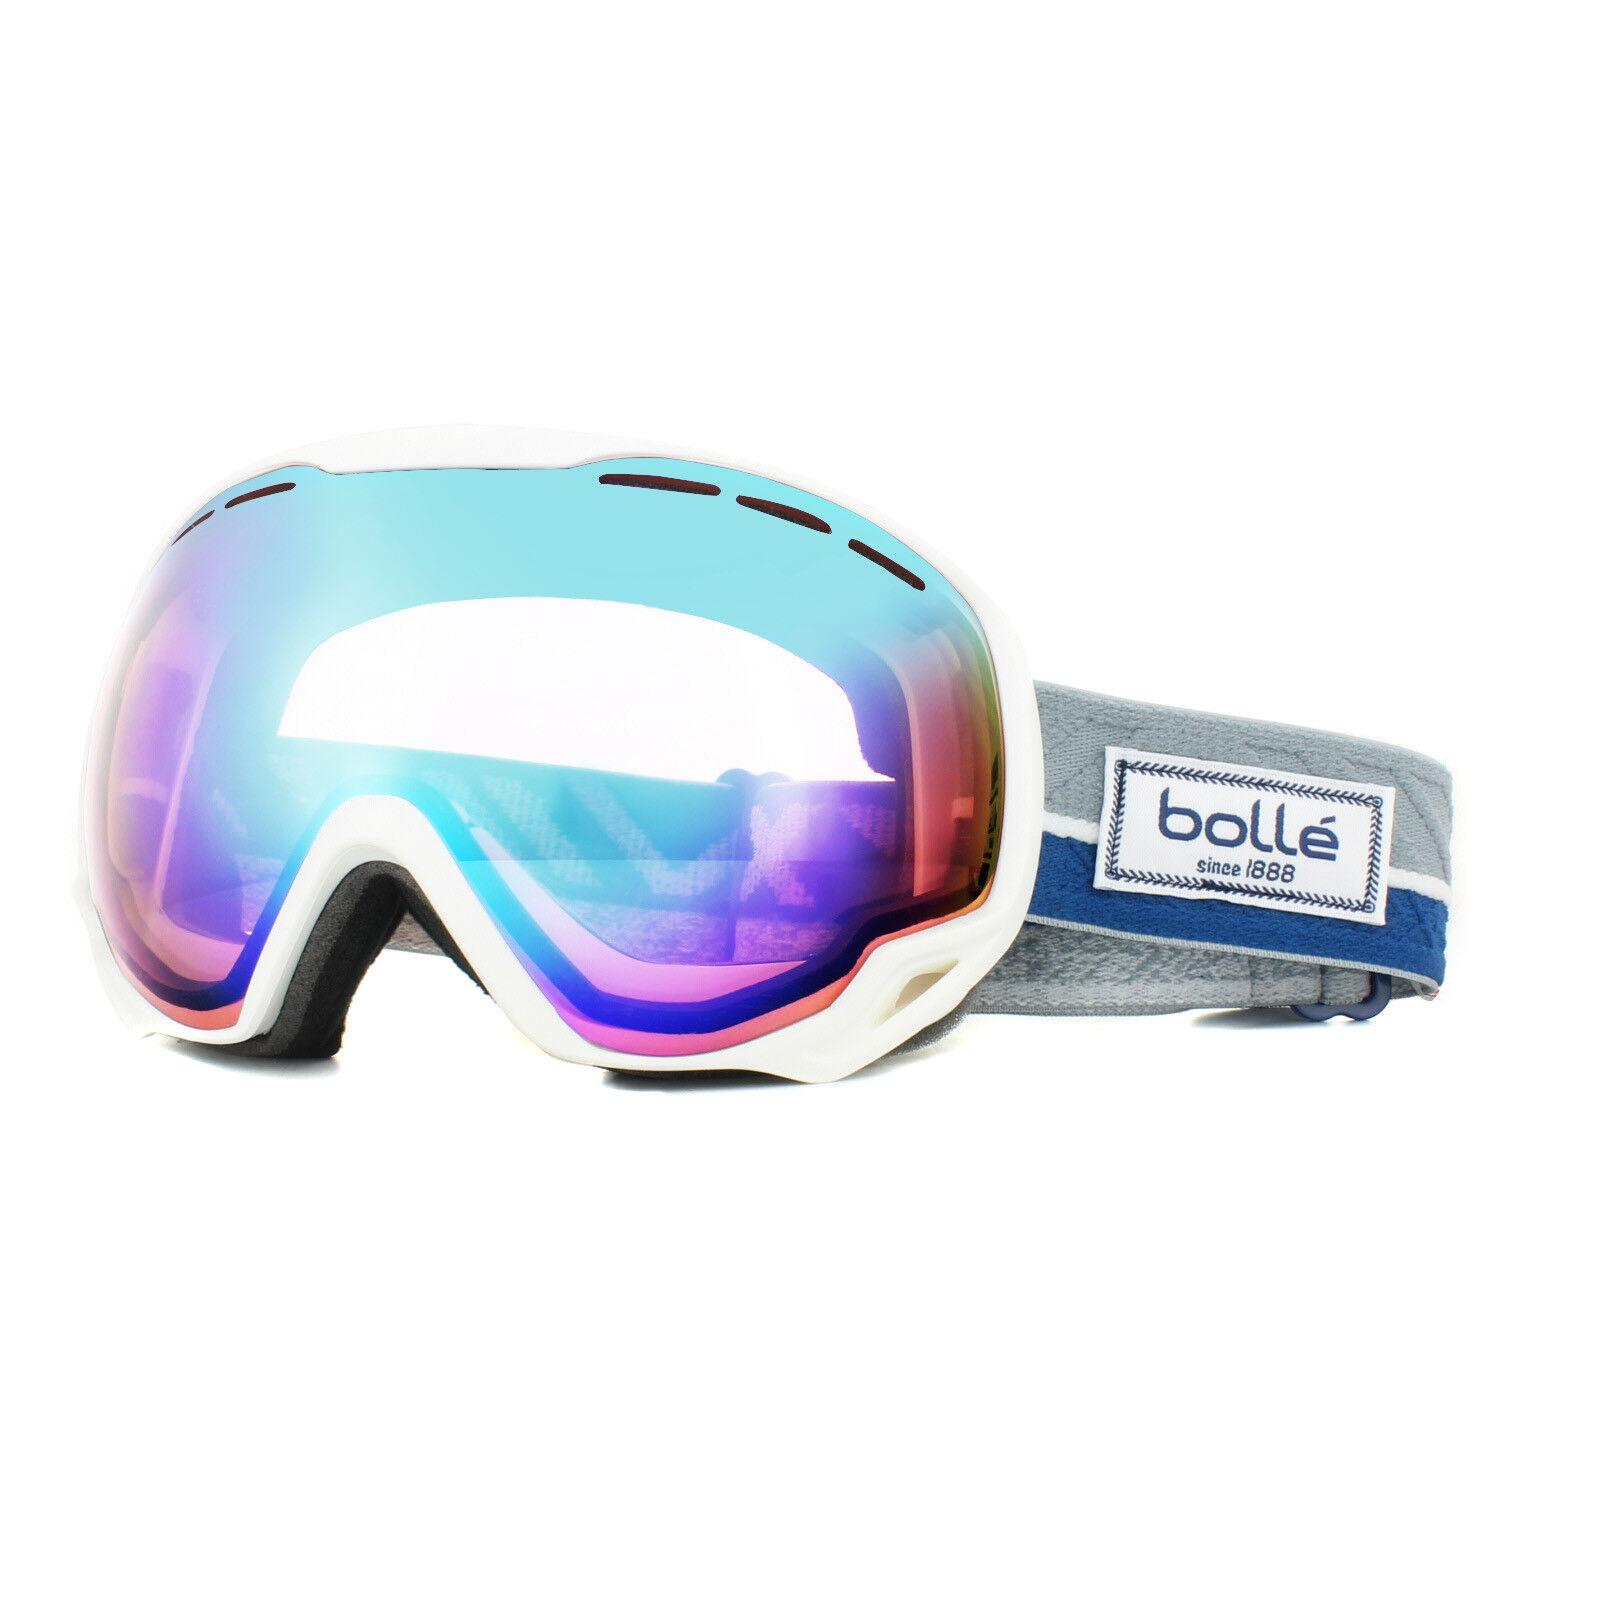 Bolle Ski Goggles Emperor 21450 White & bluee Etnic Aurora